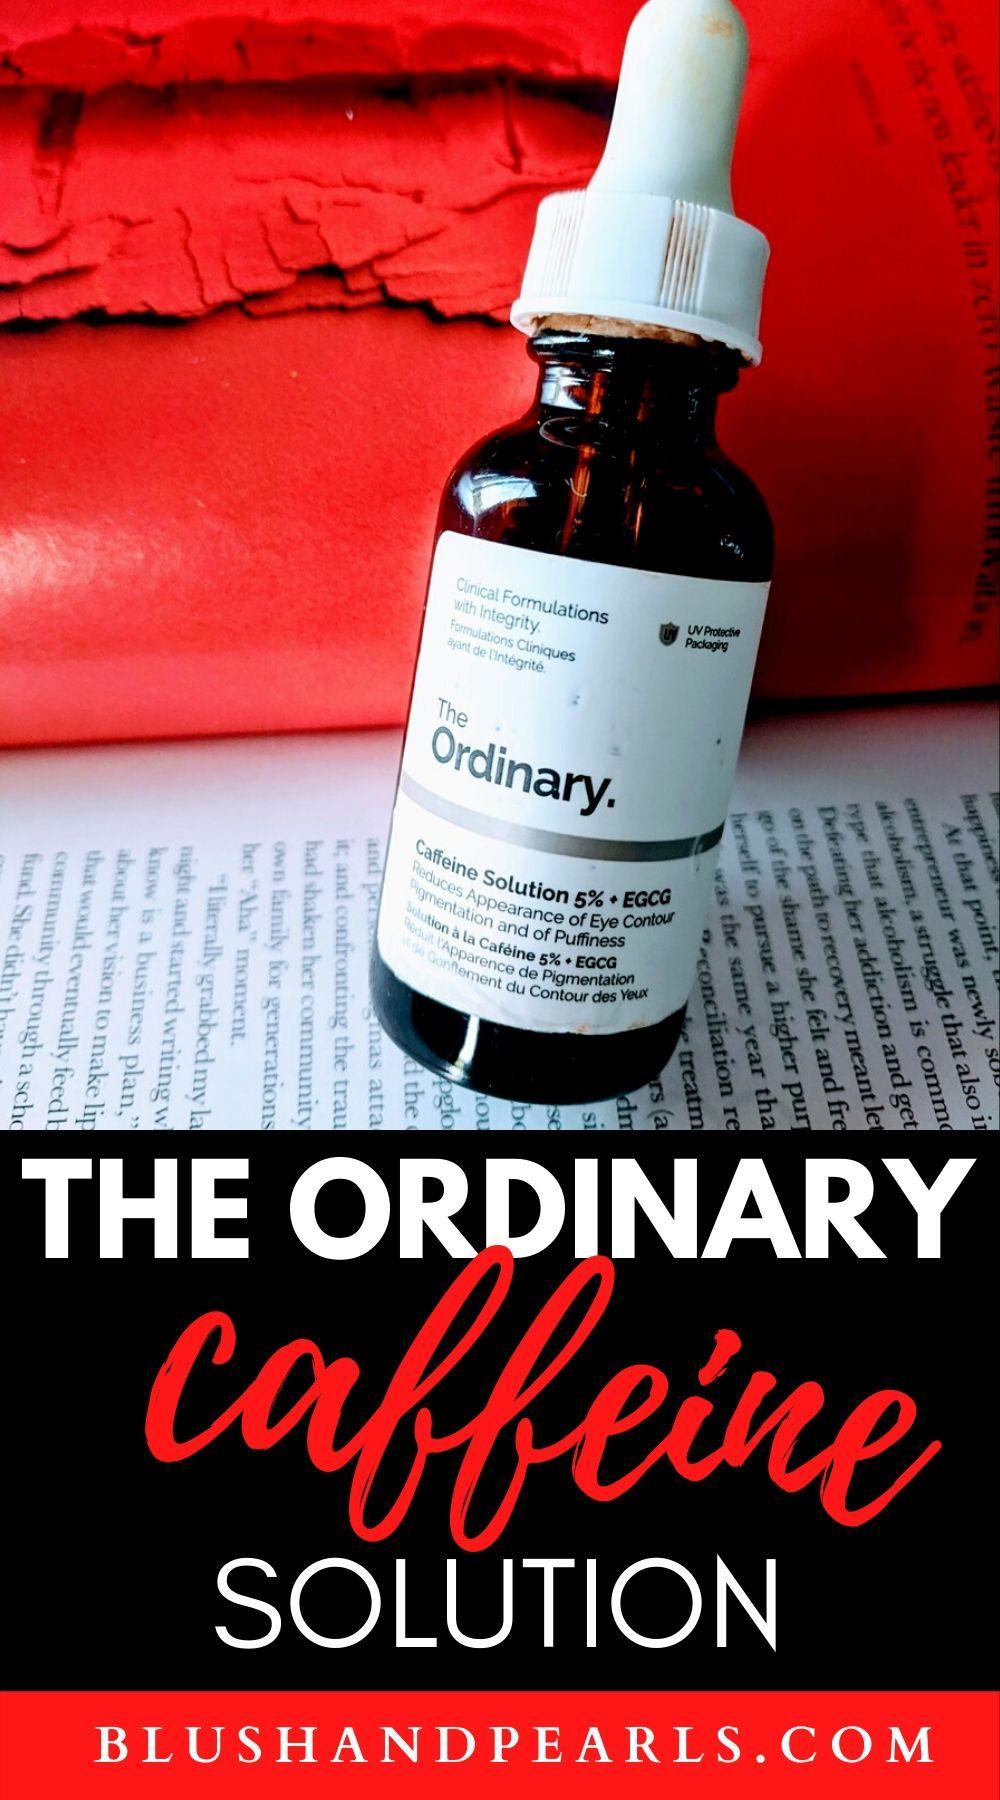 The Ordinary Caffeine Solution 5 + EGCG Is My GoTo Eye